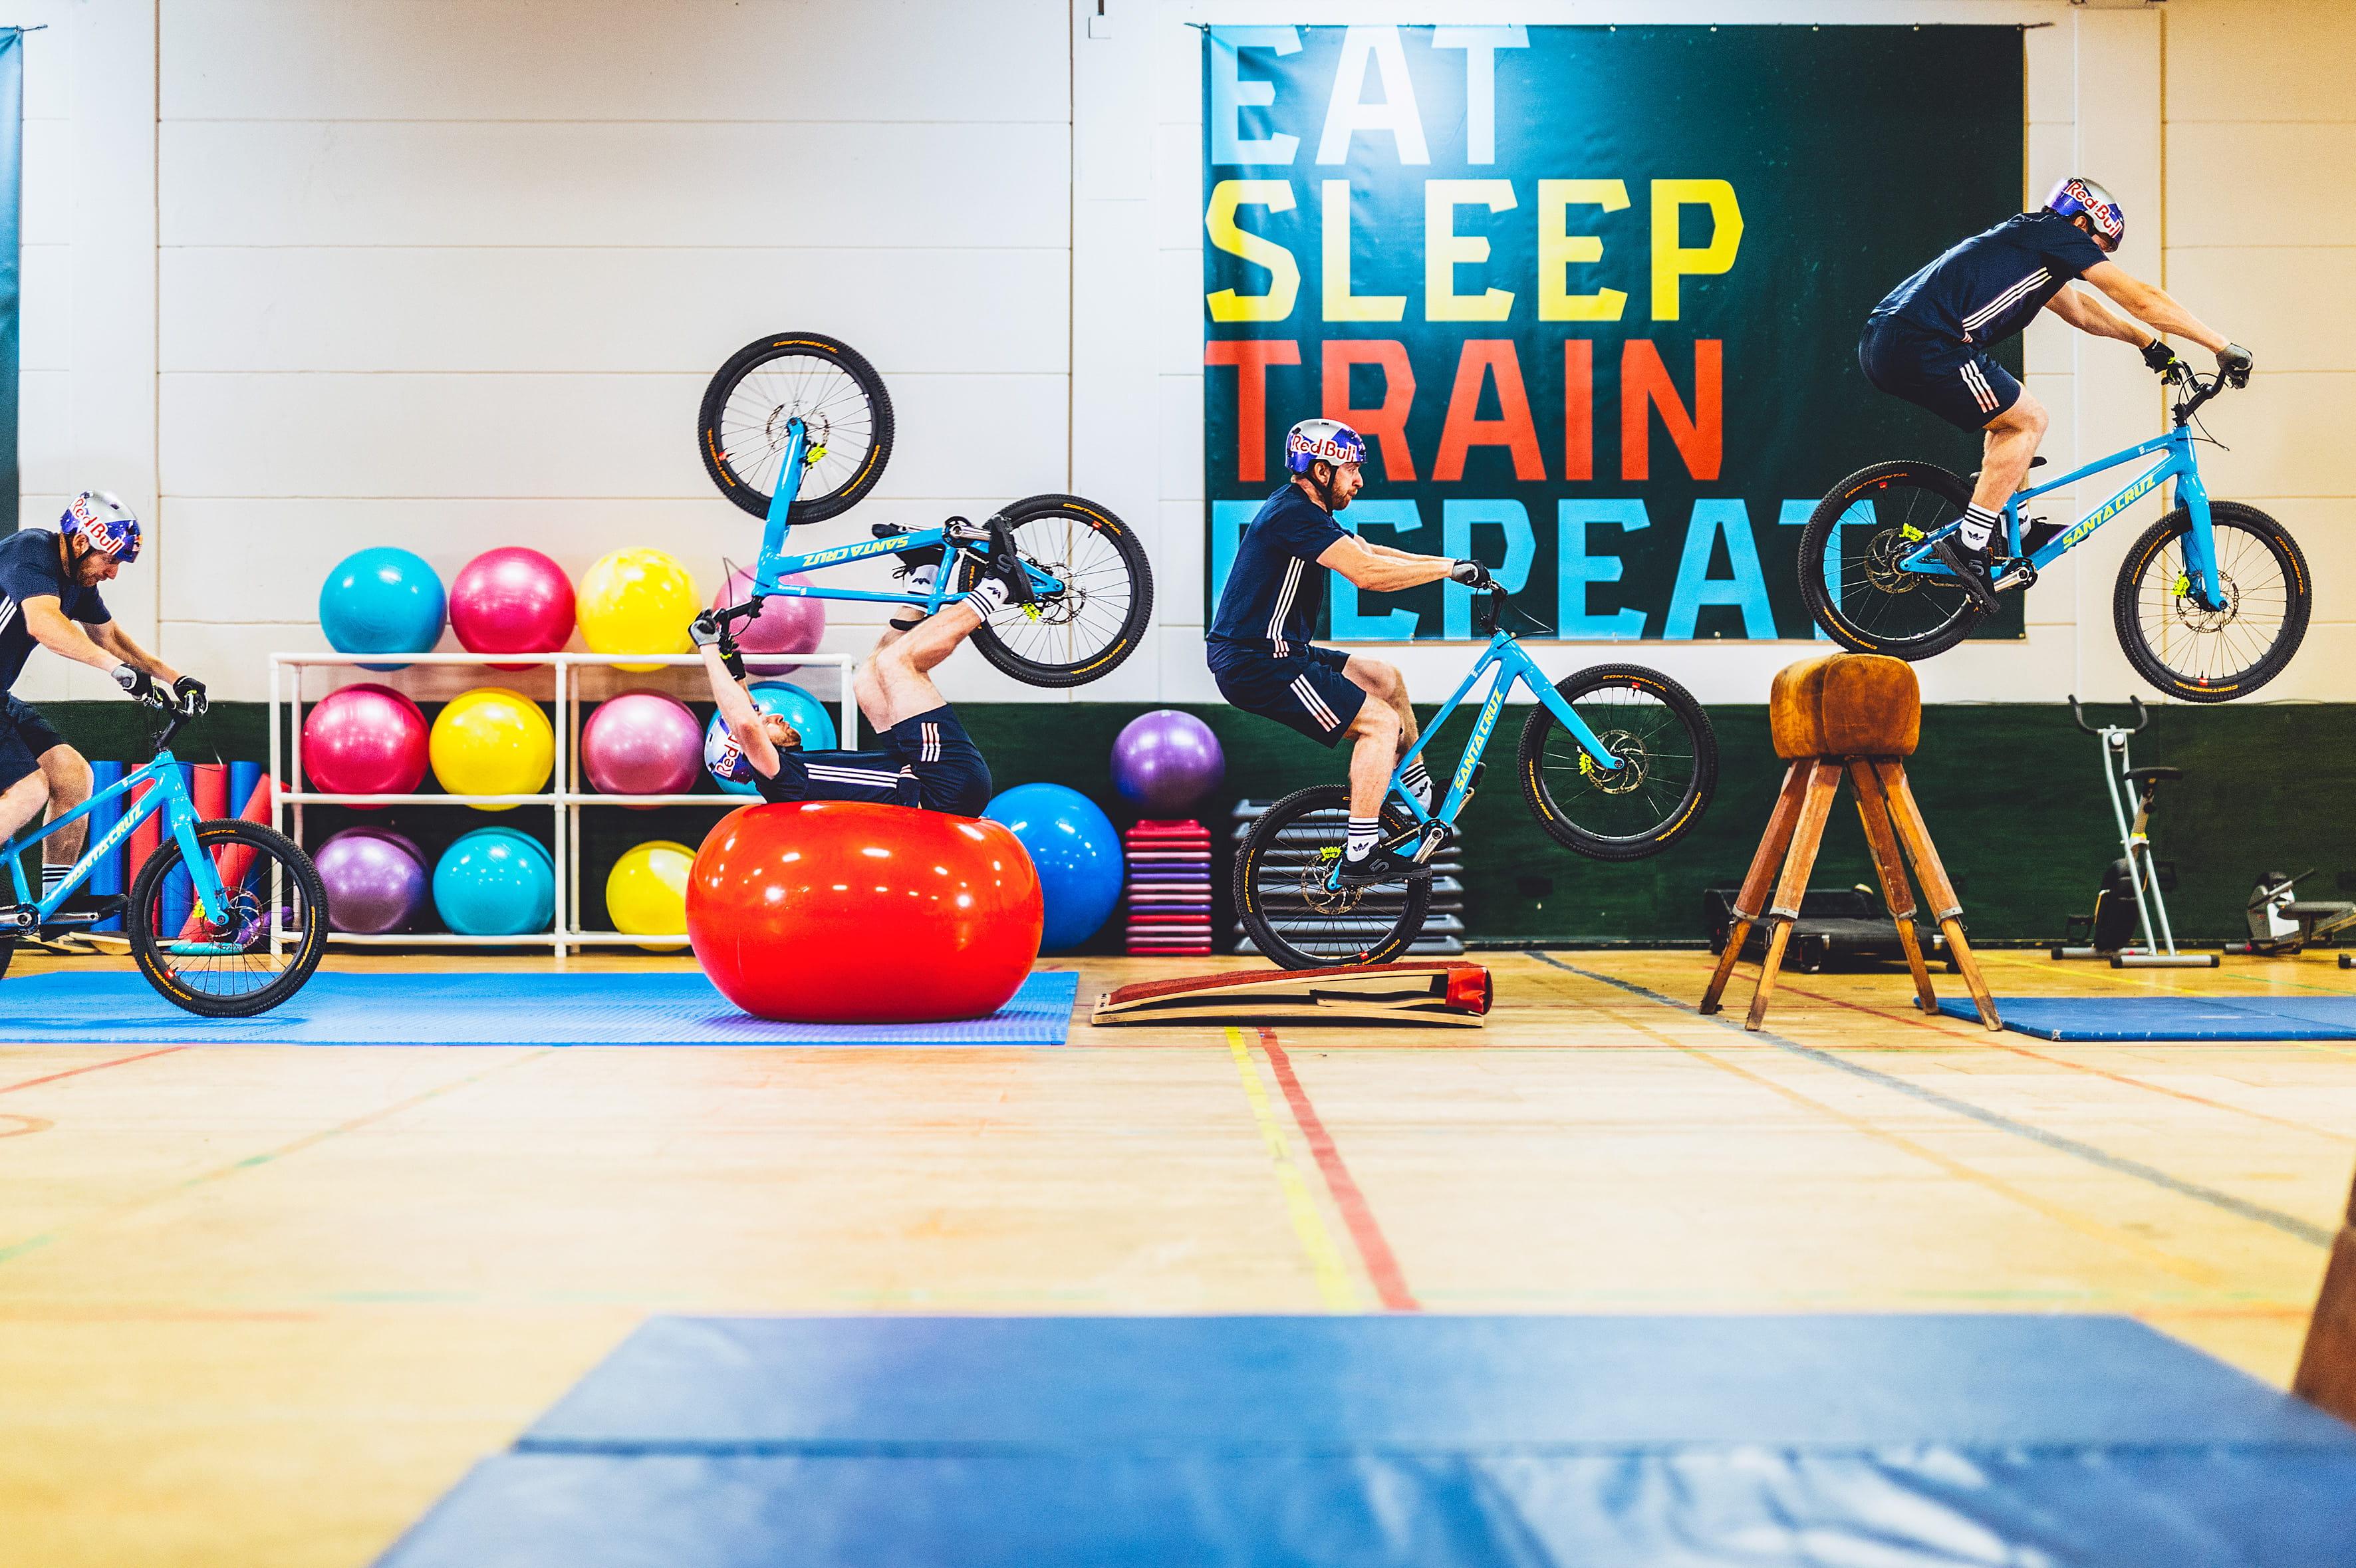 Danny-MacAskill_Gymnasium_-c-_RedBullContentPool_Fred_Murray-23